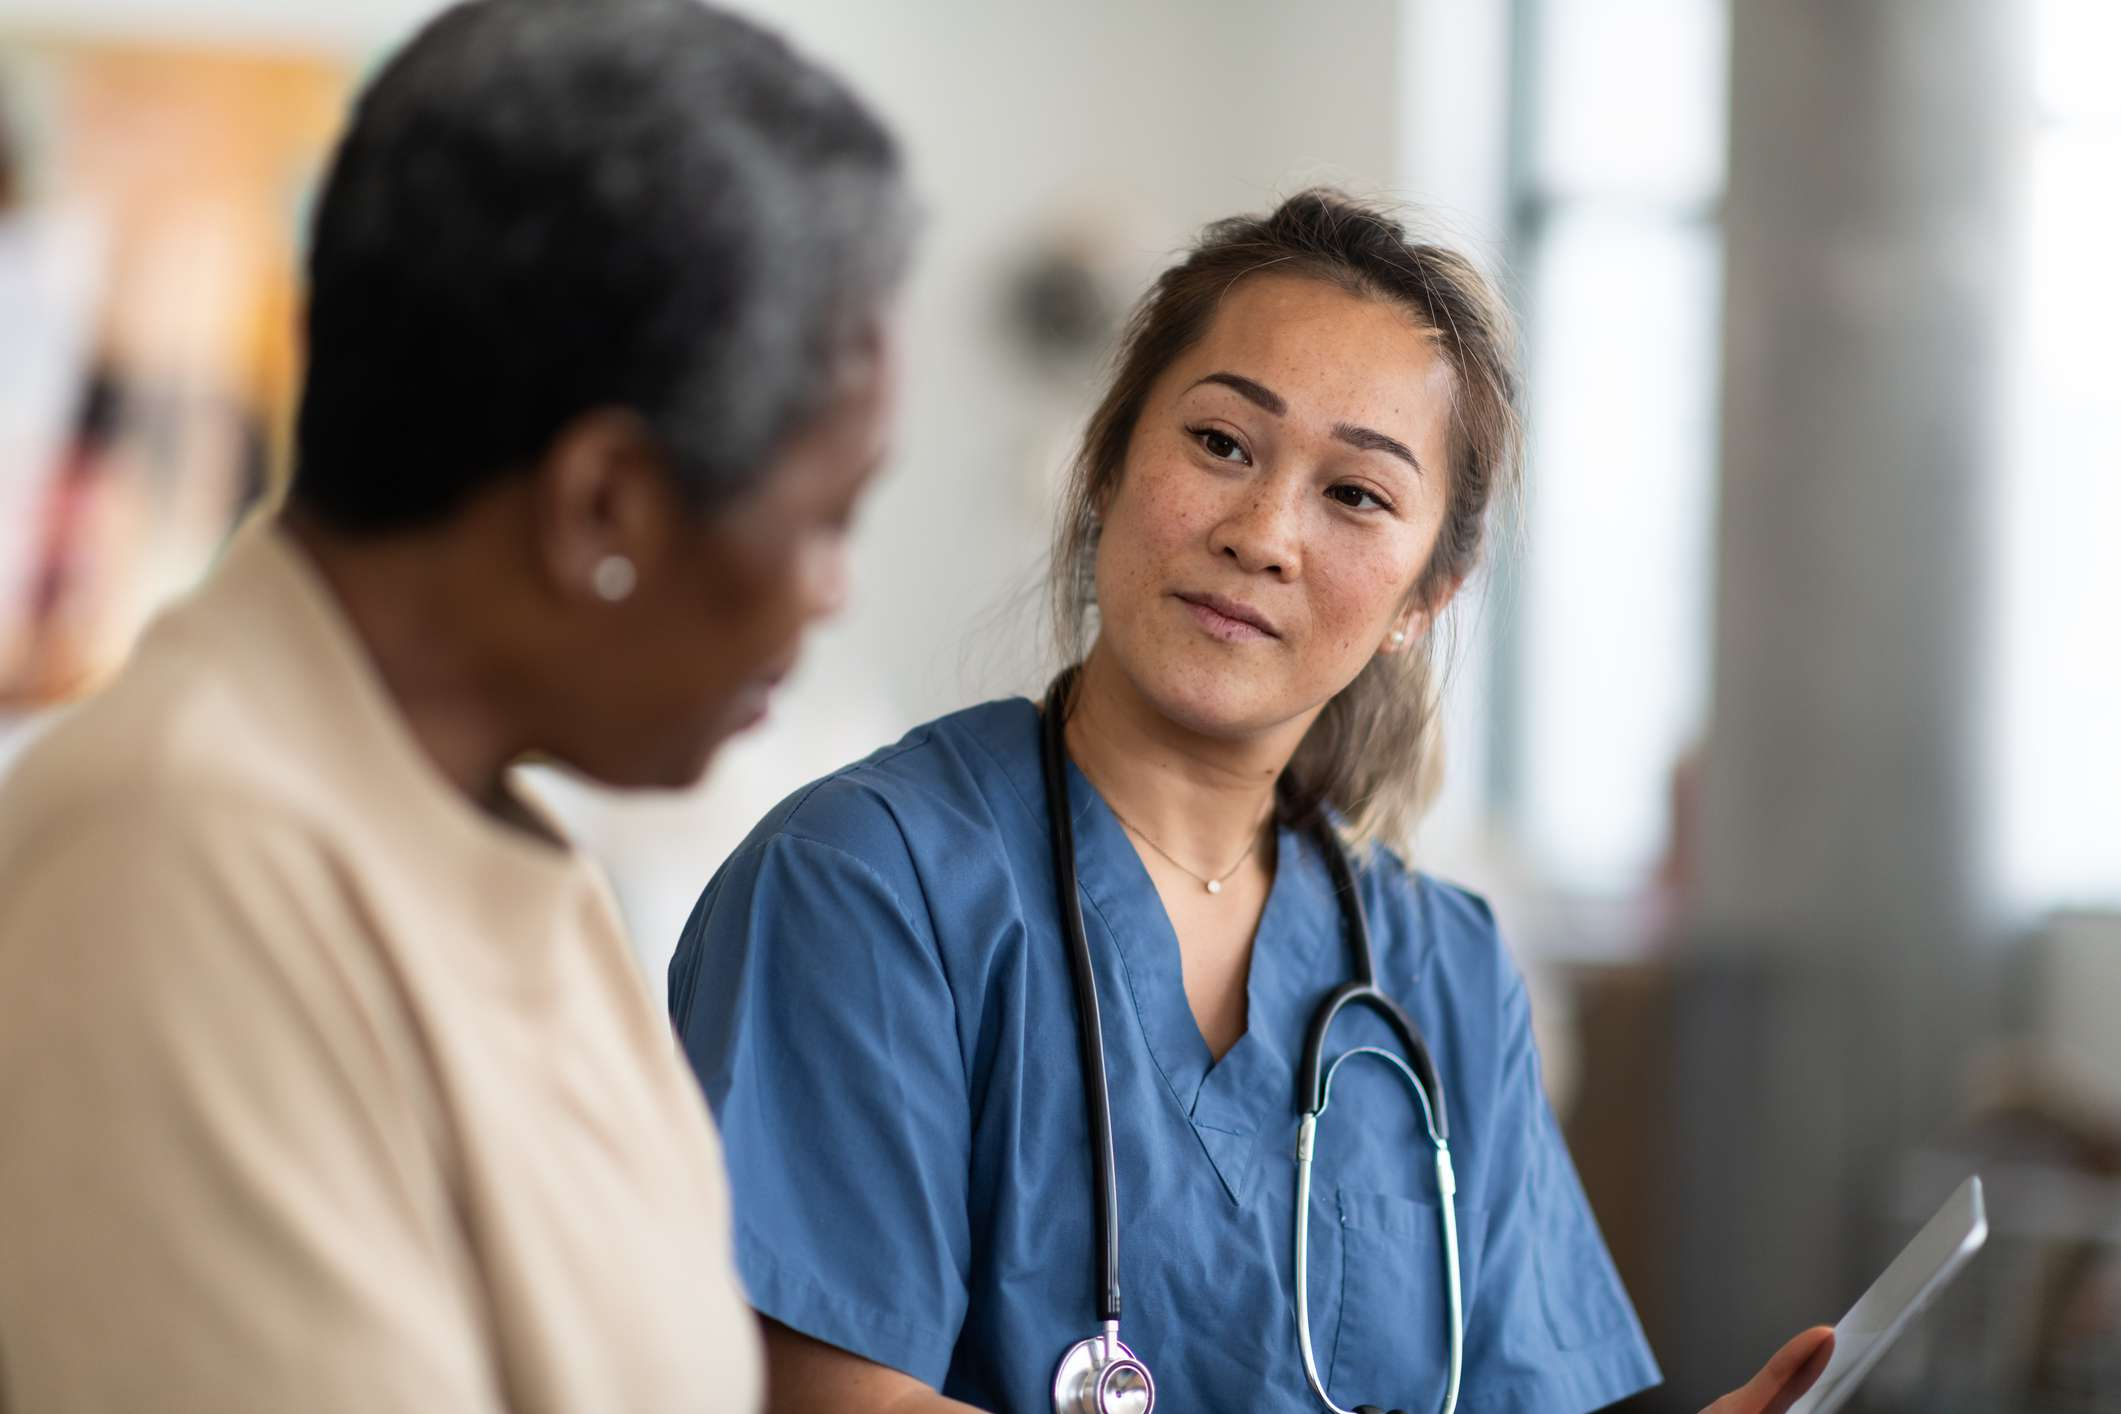 Doctor discusses valsartan with patient